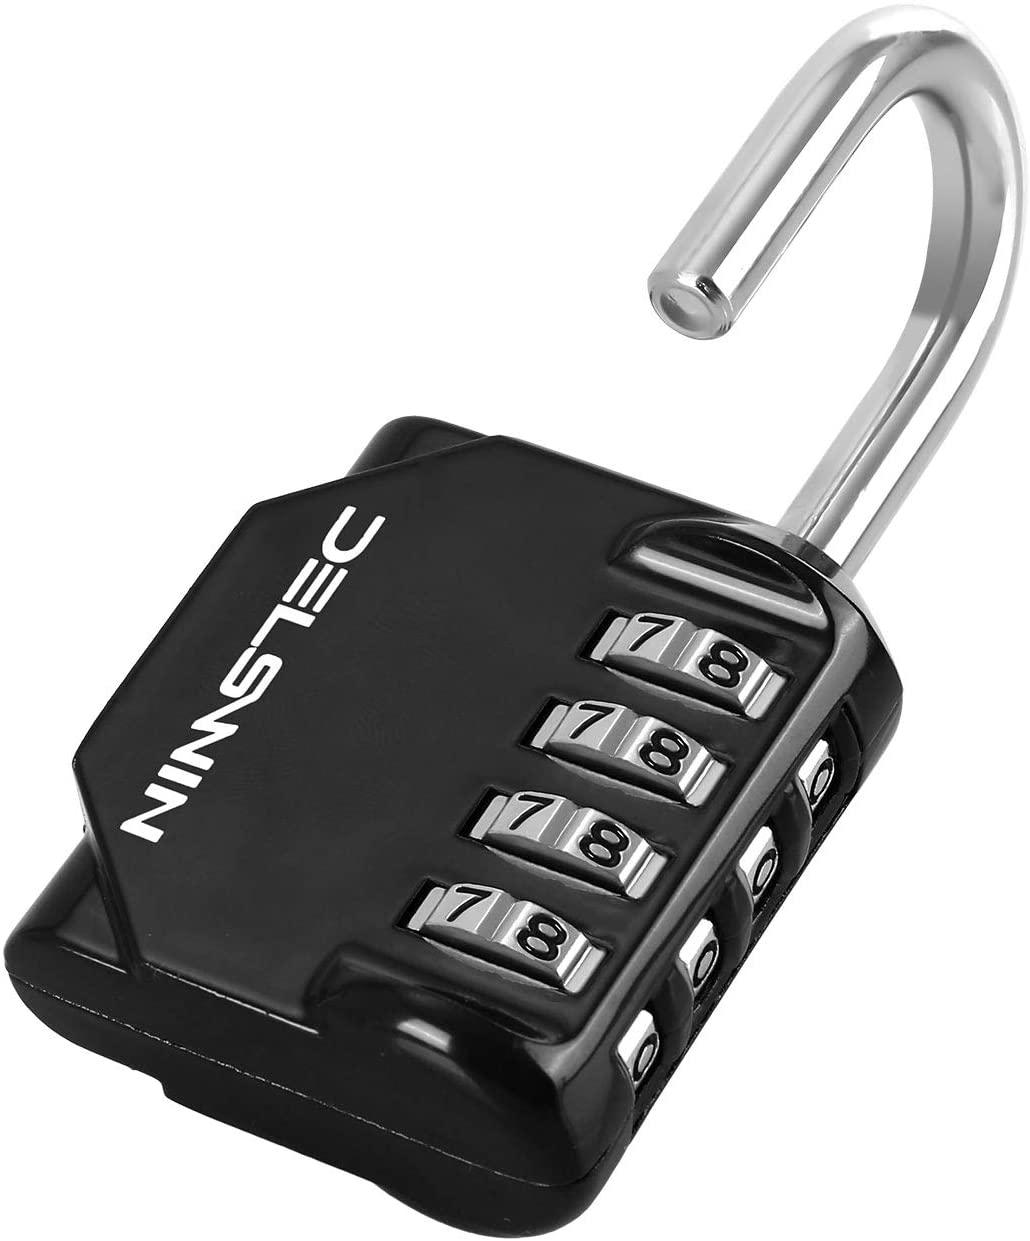 4 Digit Combination Lock - Hardened Steel Combo Lock,Combination Padlock for Gym Locker,Sports Locker,Fence,Black